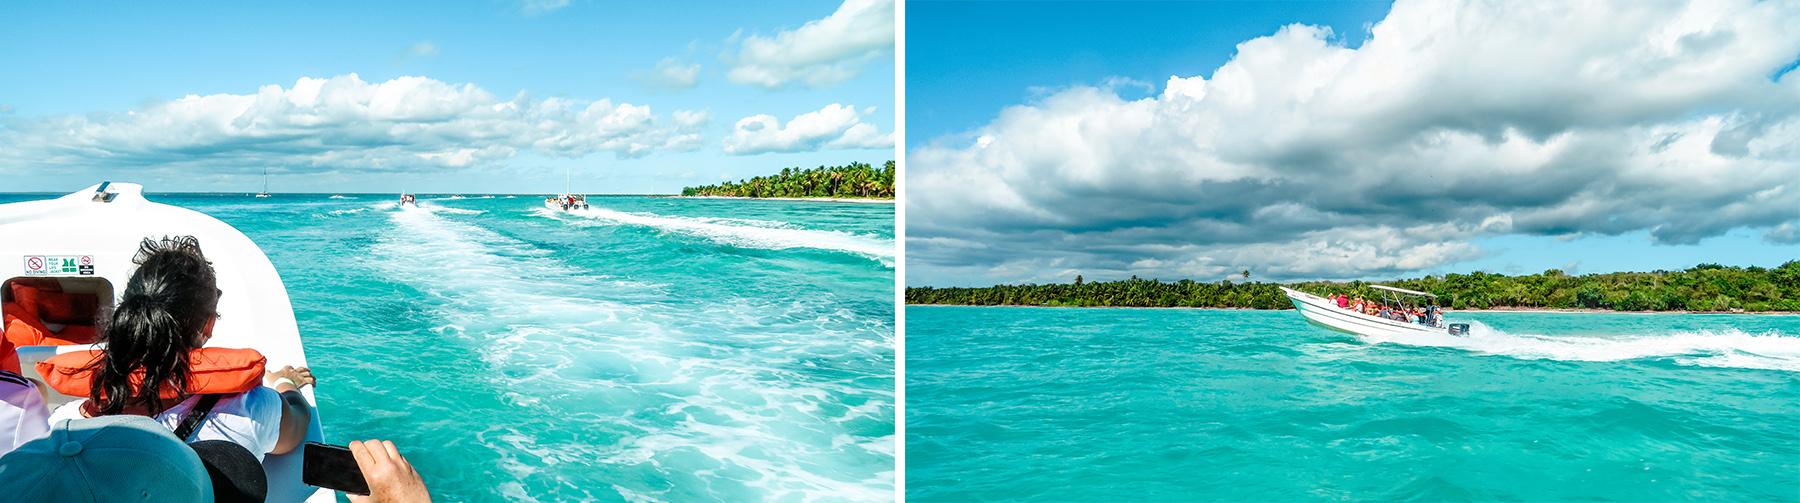 Dominikanische Republik Isla Saona Speedboot